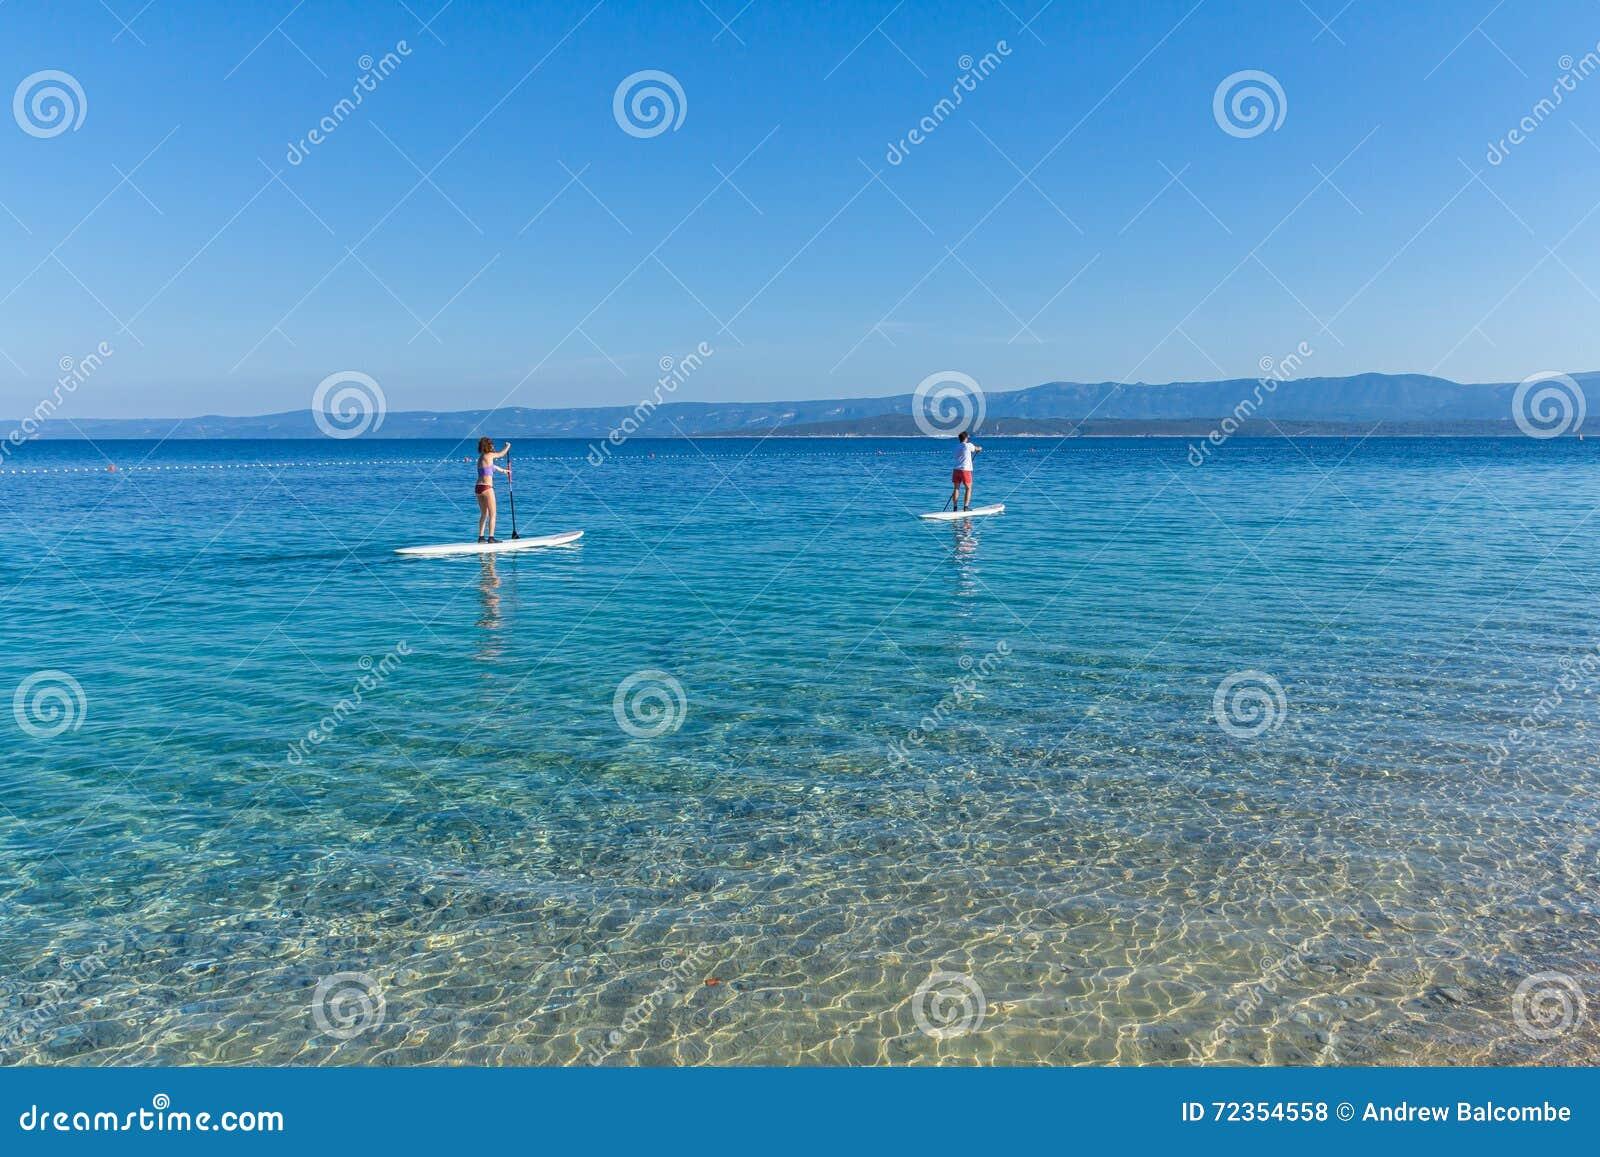 Standup Paddelinternatsschüler an Zlatni-Ratte setzen, Kroatien auf den Strand